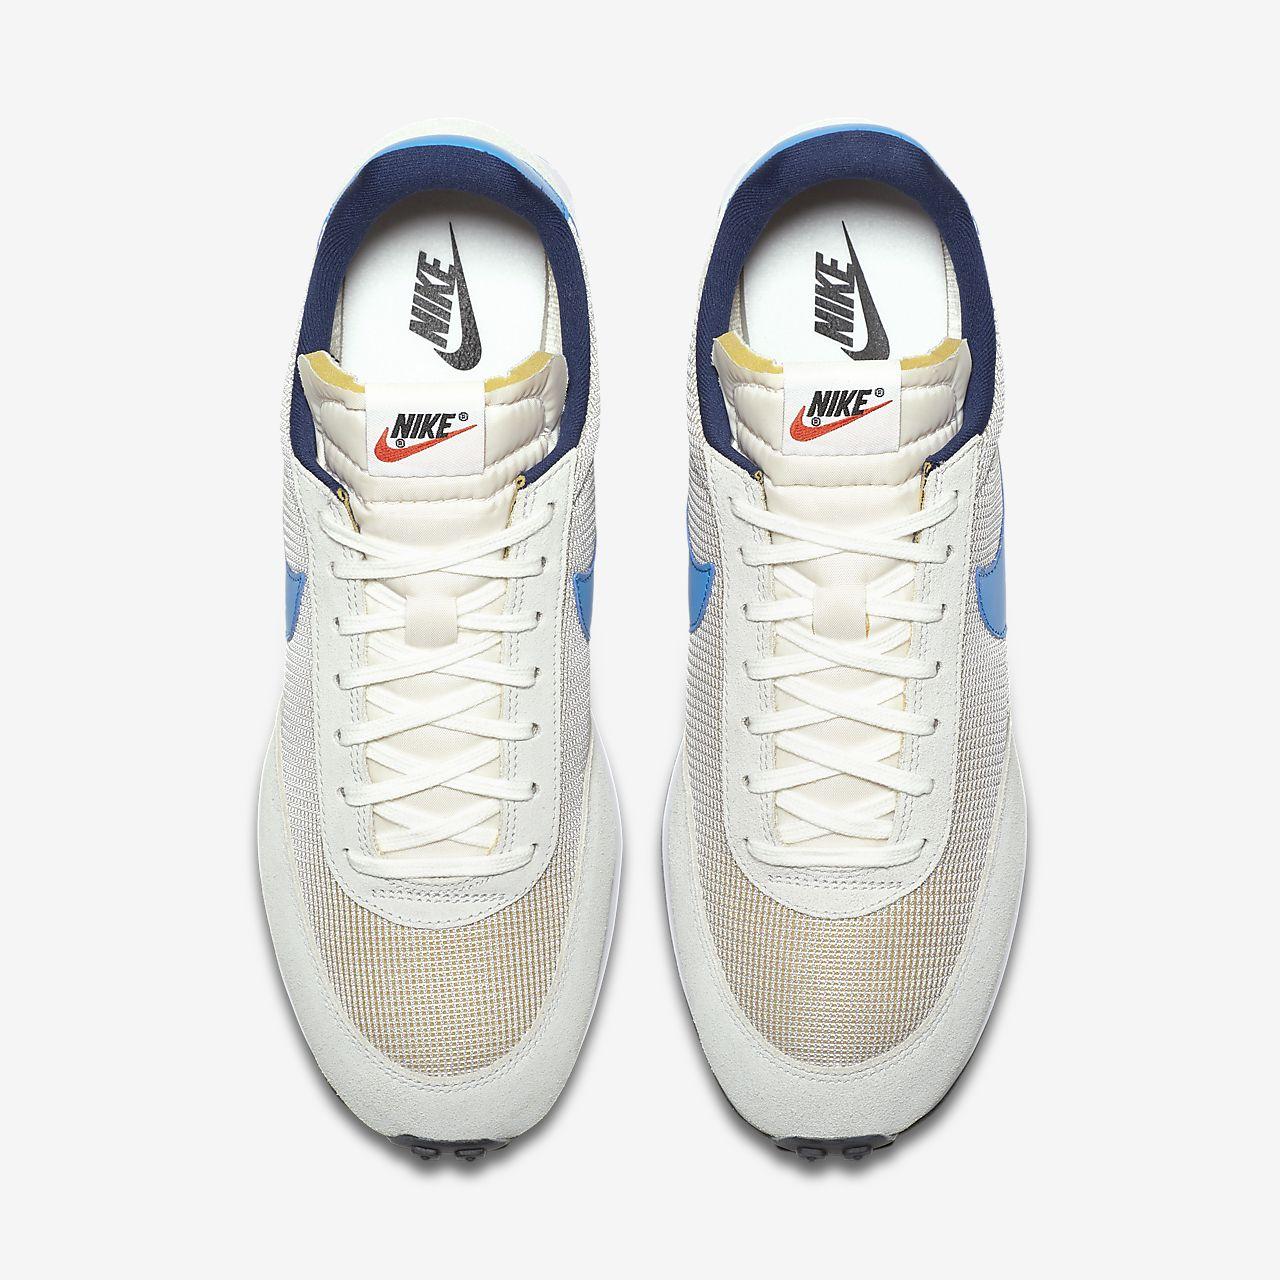 0cc5d570c Nike Air Tailwind 79 OG Men s Shoe. Nike.com CA